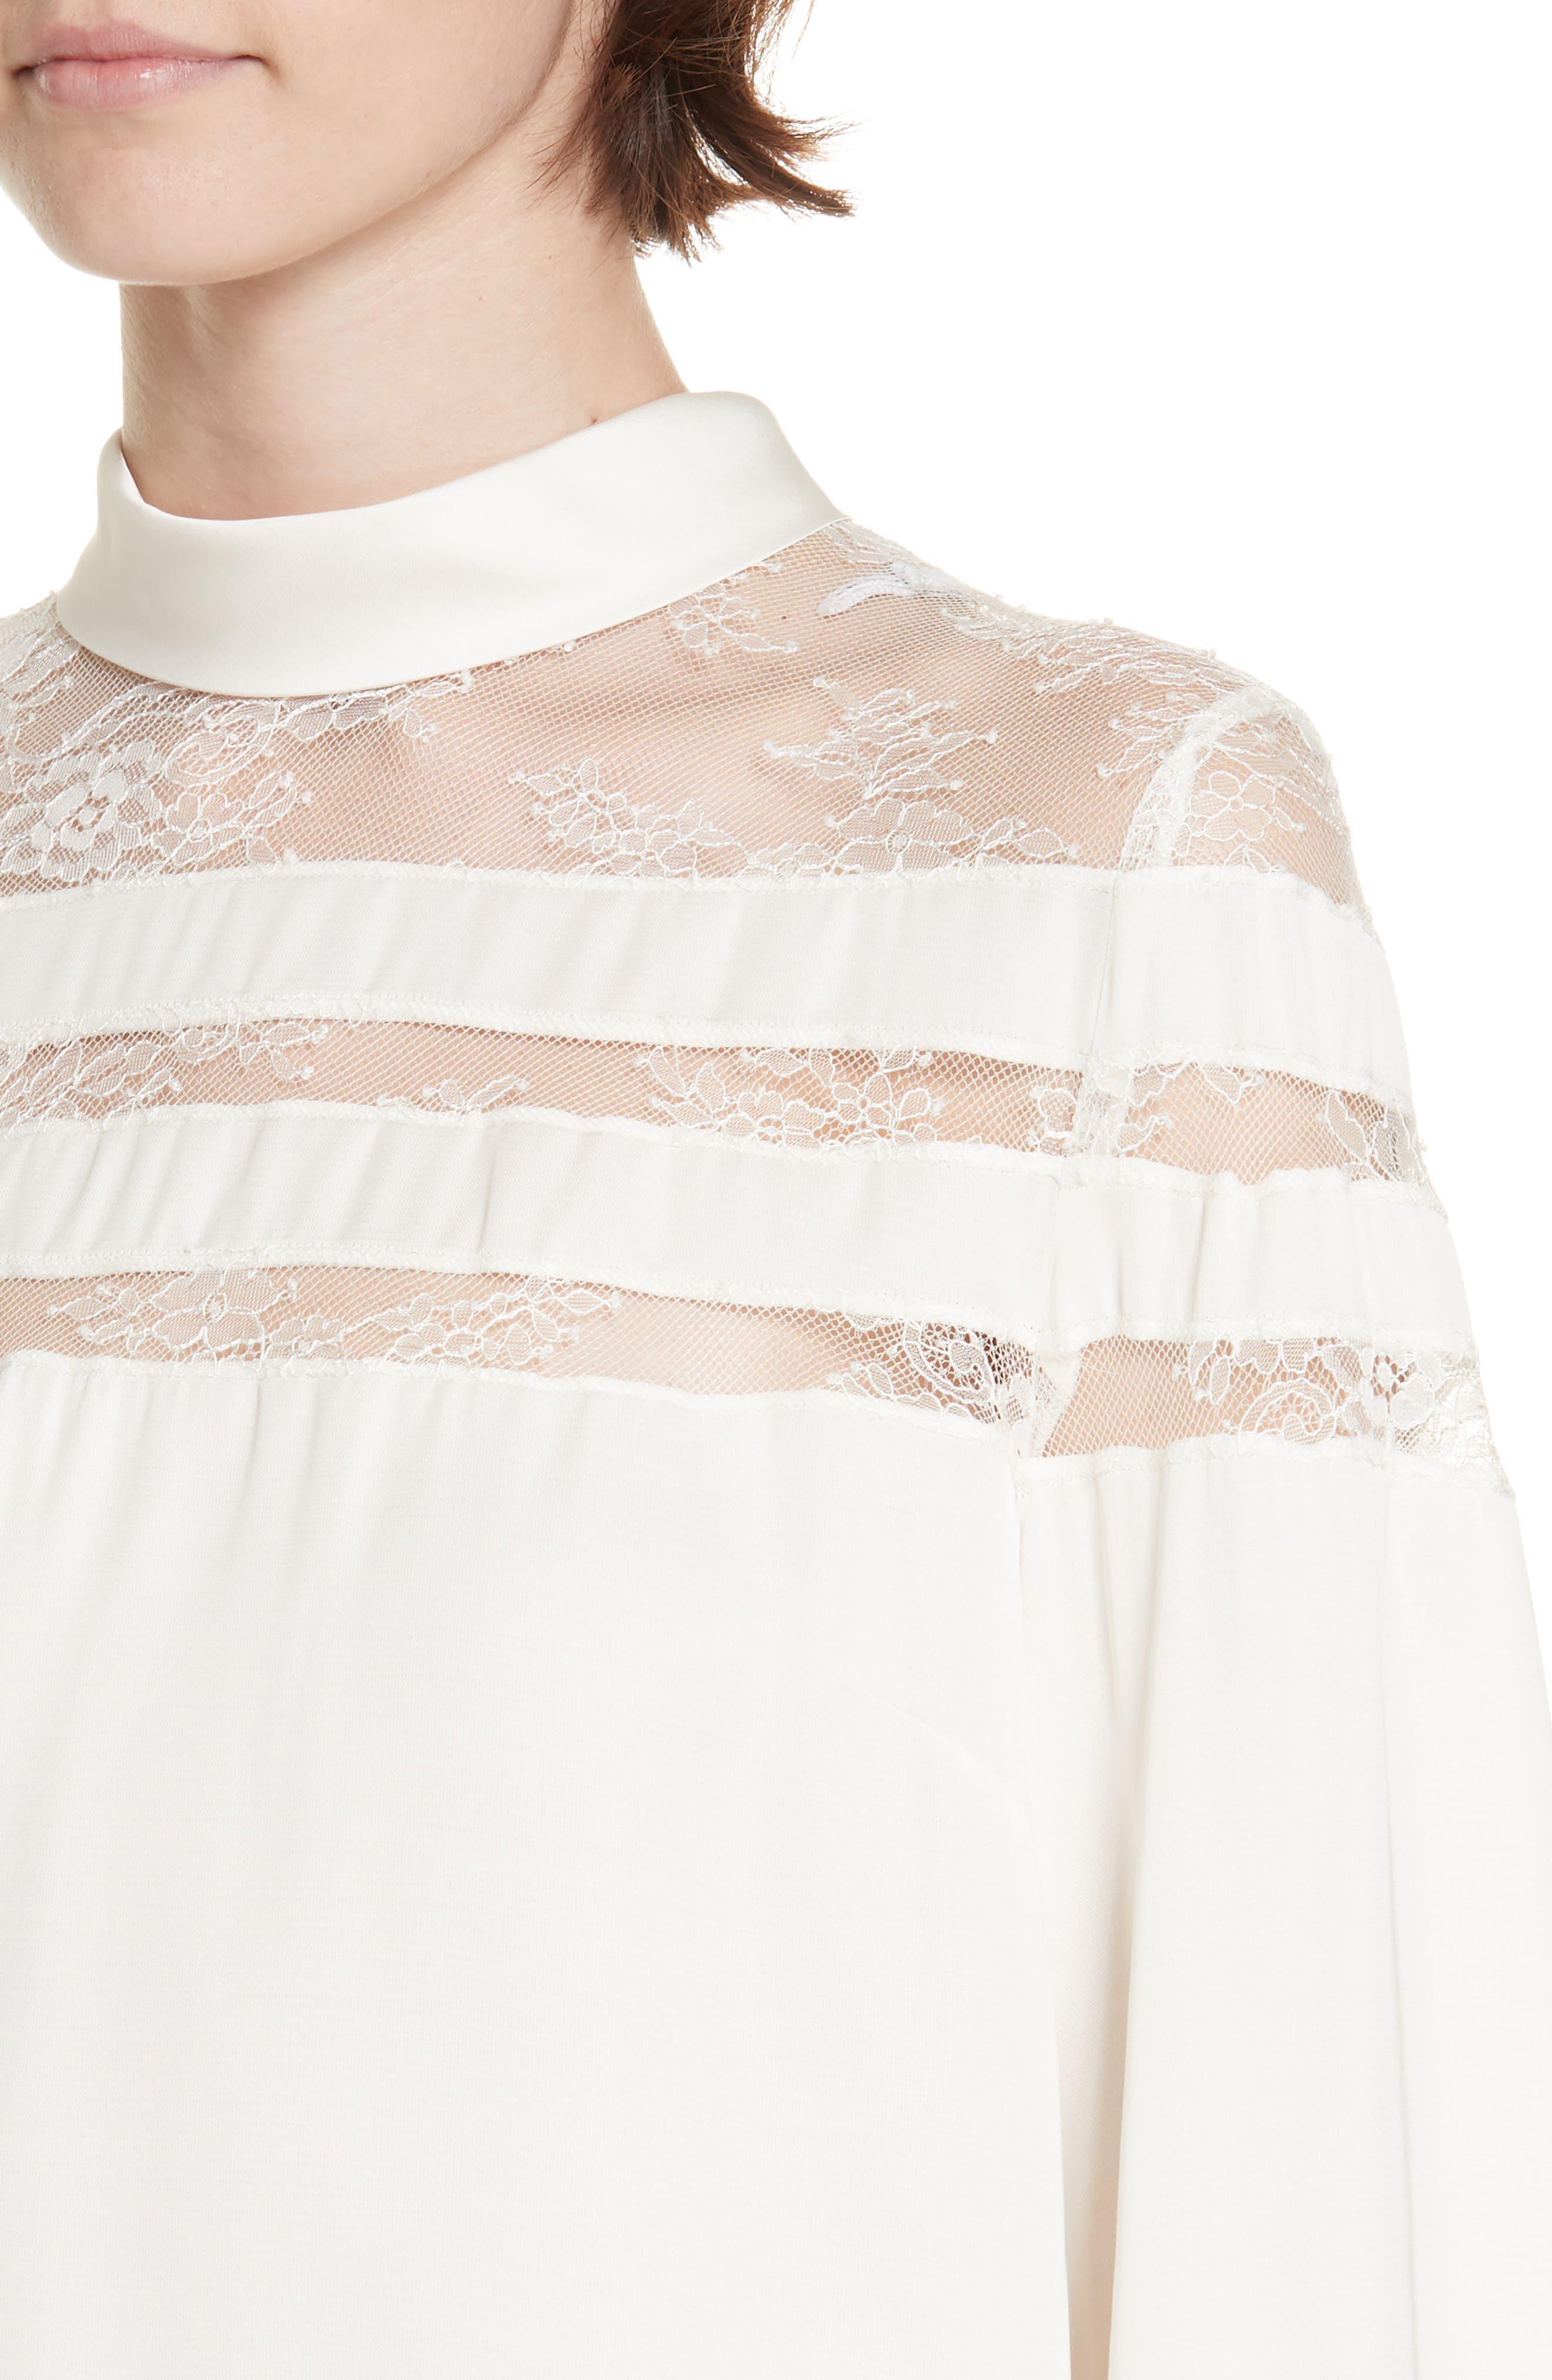 Mirtylles Lace Detail Sheer Top,                             Alternate thumbnail 4, color,                             101